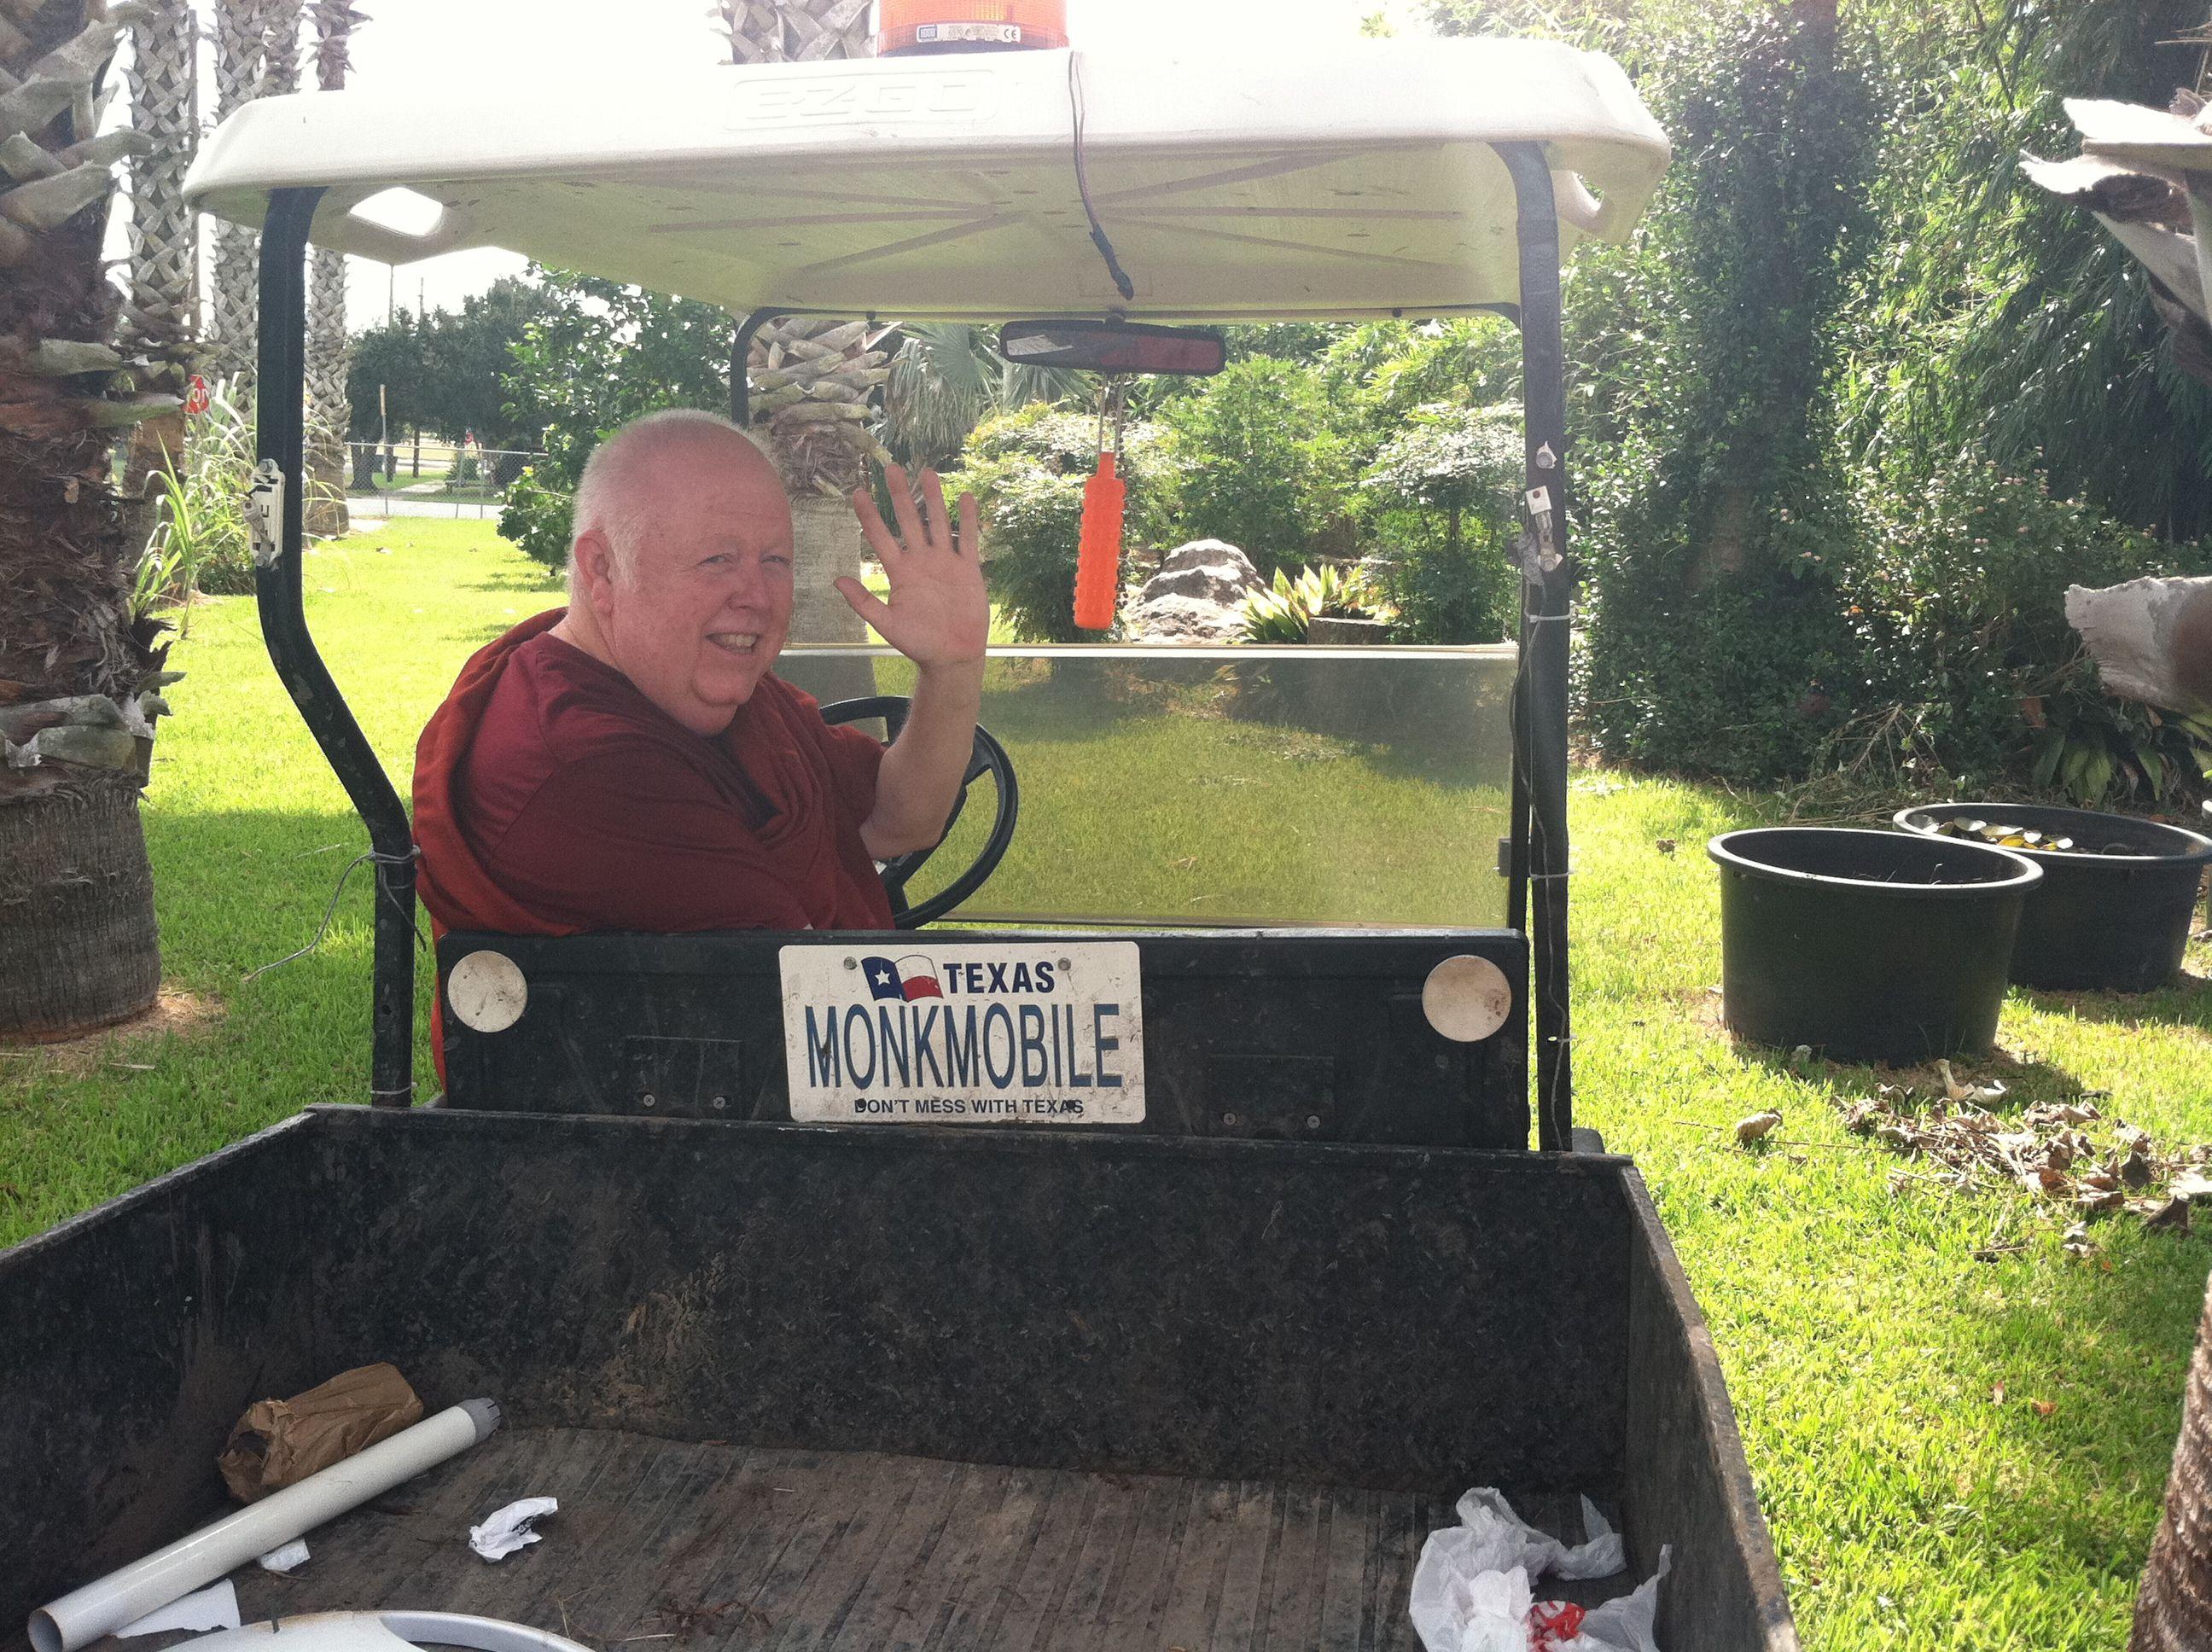 Monk mobile in port arthur texas port arthur texas